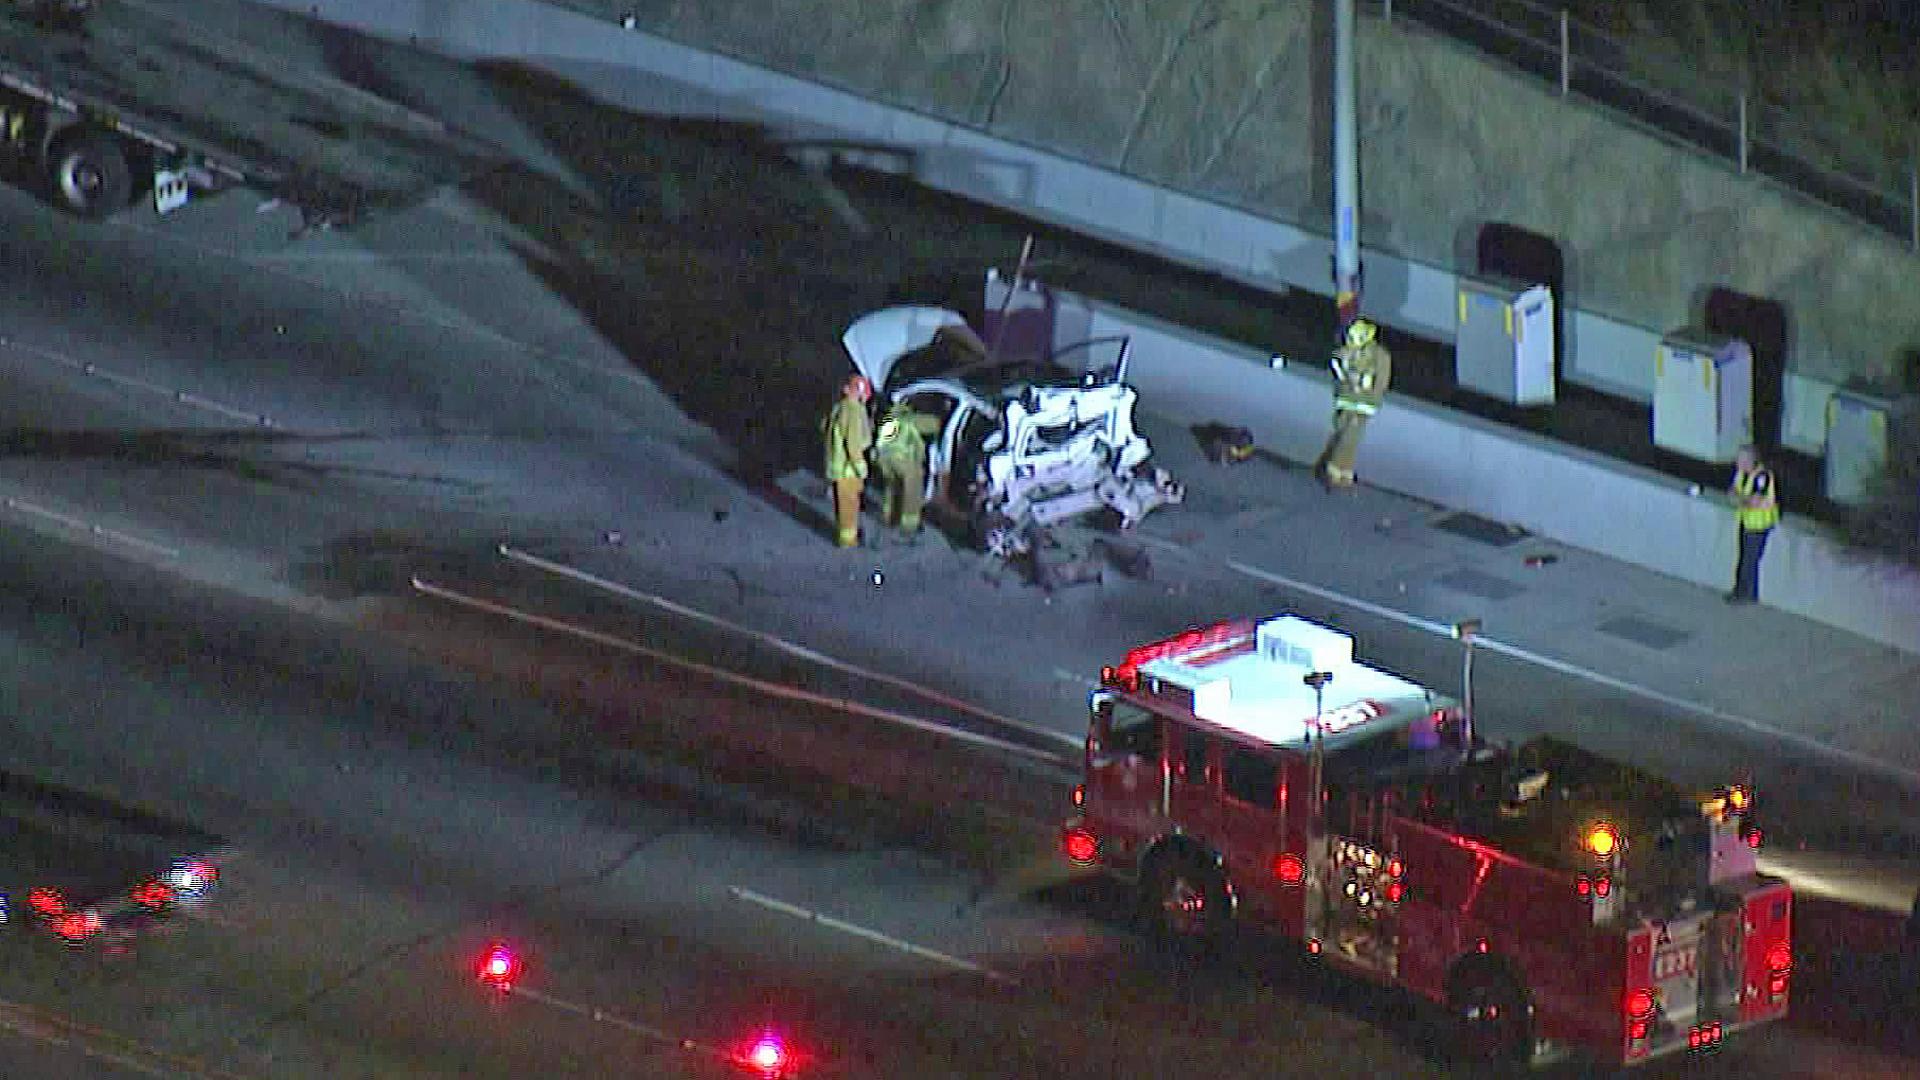 Emergency crews respond to a fatal crash on the 405 Freeway on Oct. 8, 2019. (Credit: KTLA)